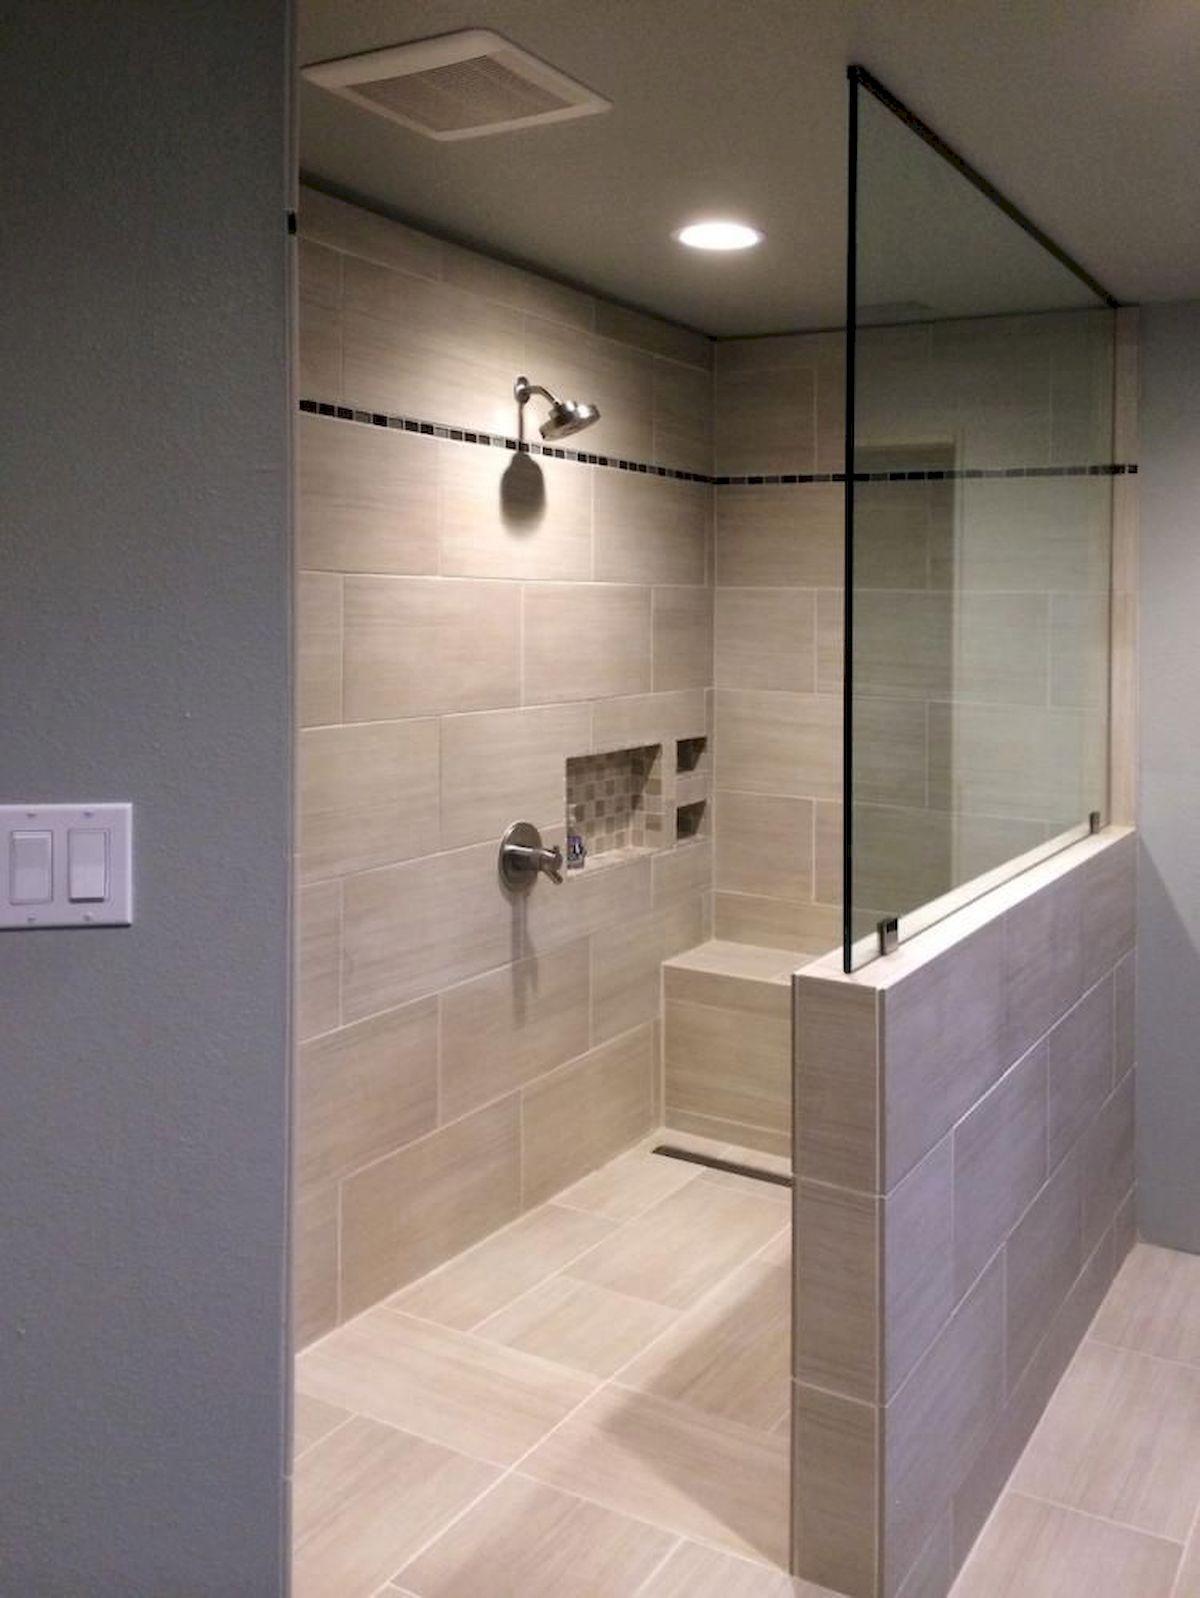 99 amazing bathroom ideas for your inspirations bed bath rh pinterest com